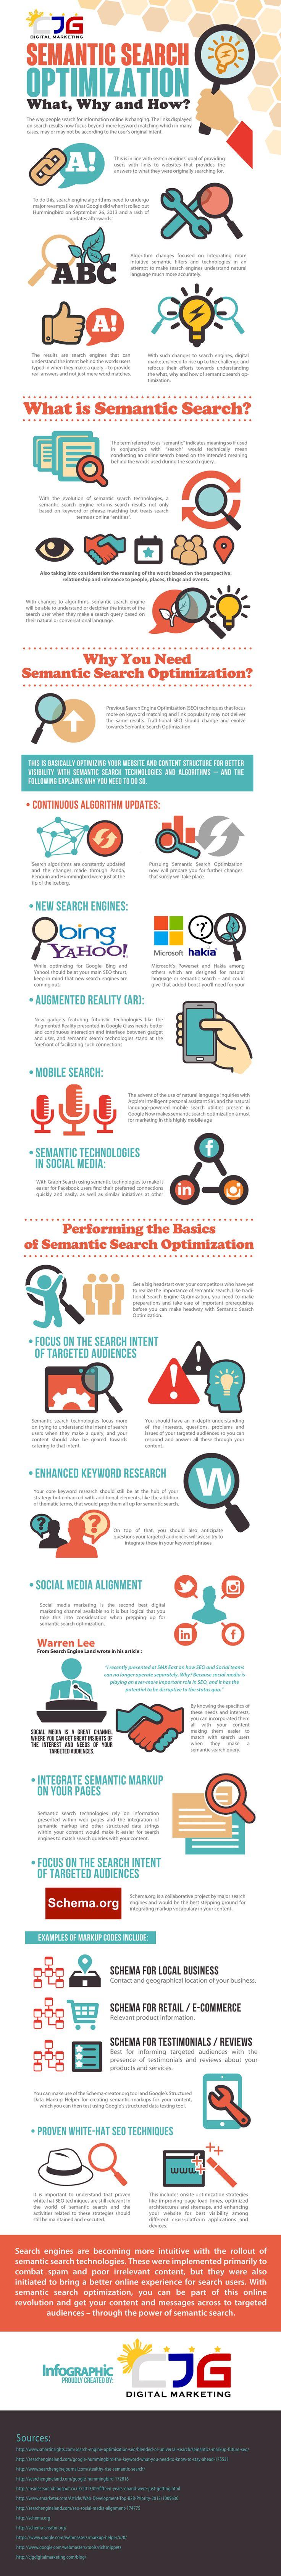 Meet New #SEO – Semantic Search Optimization